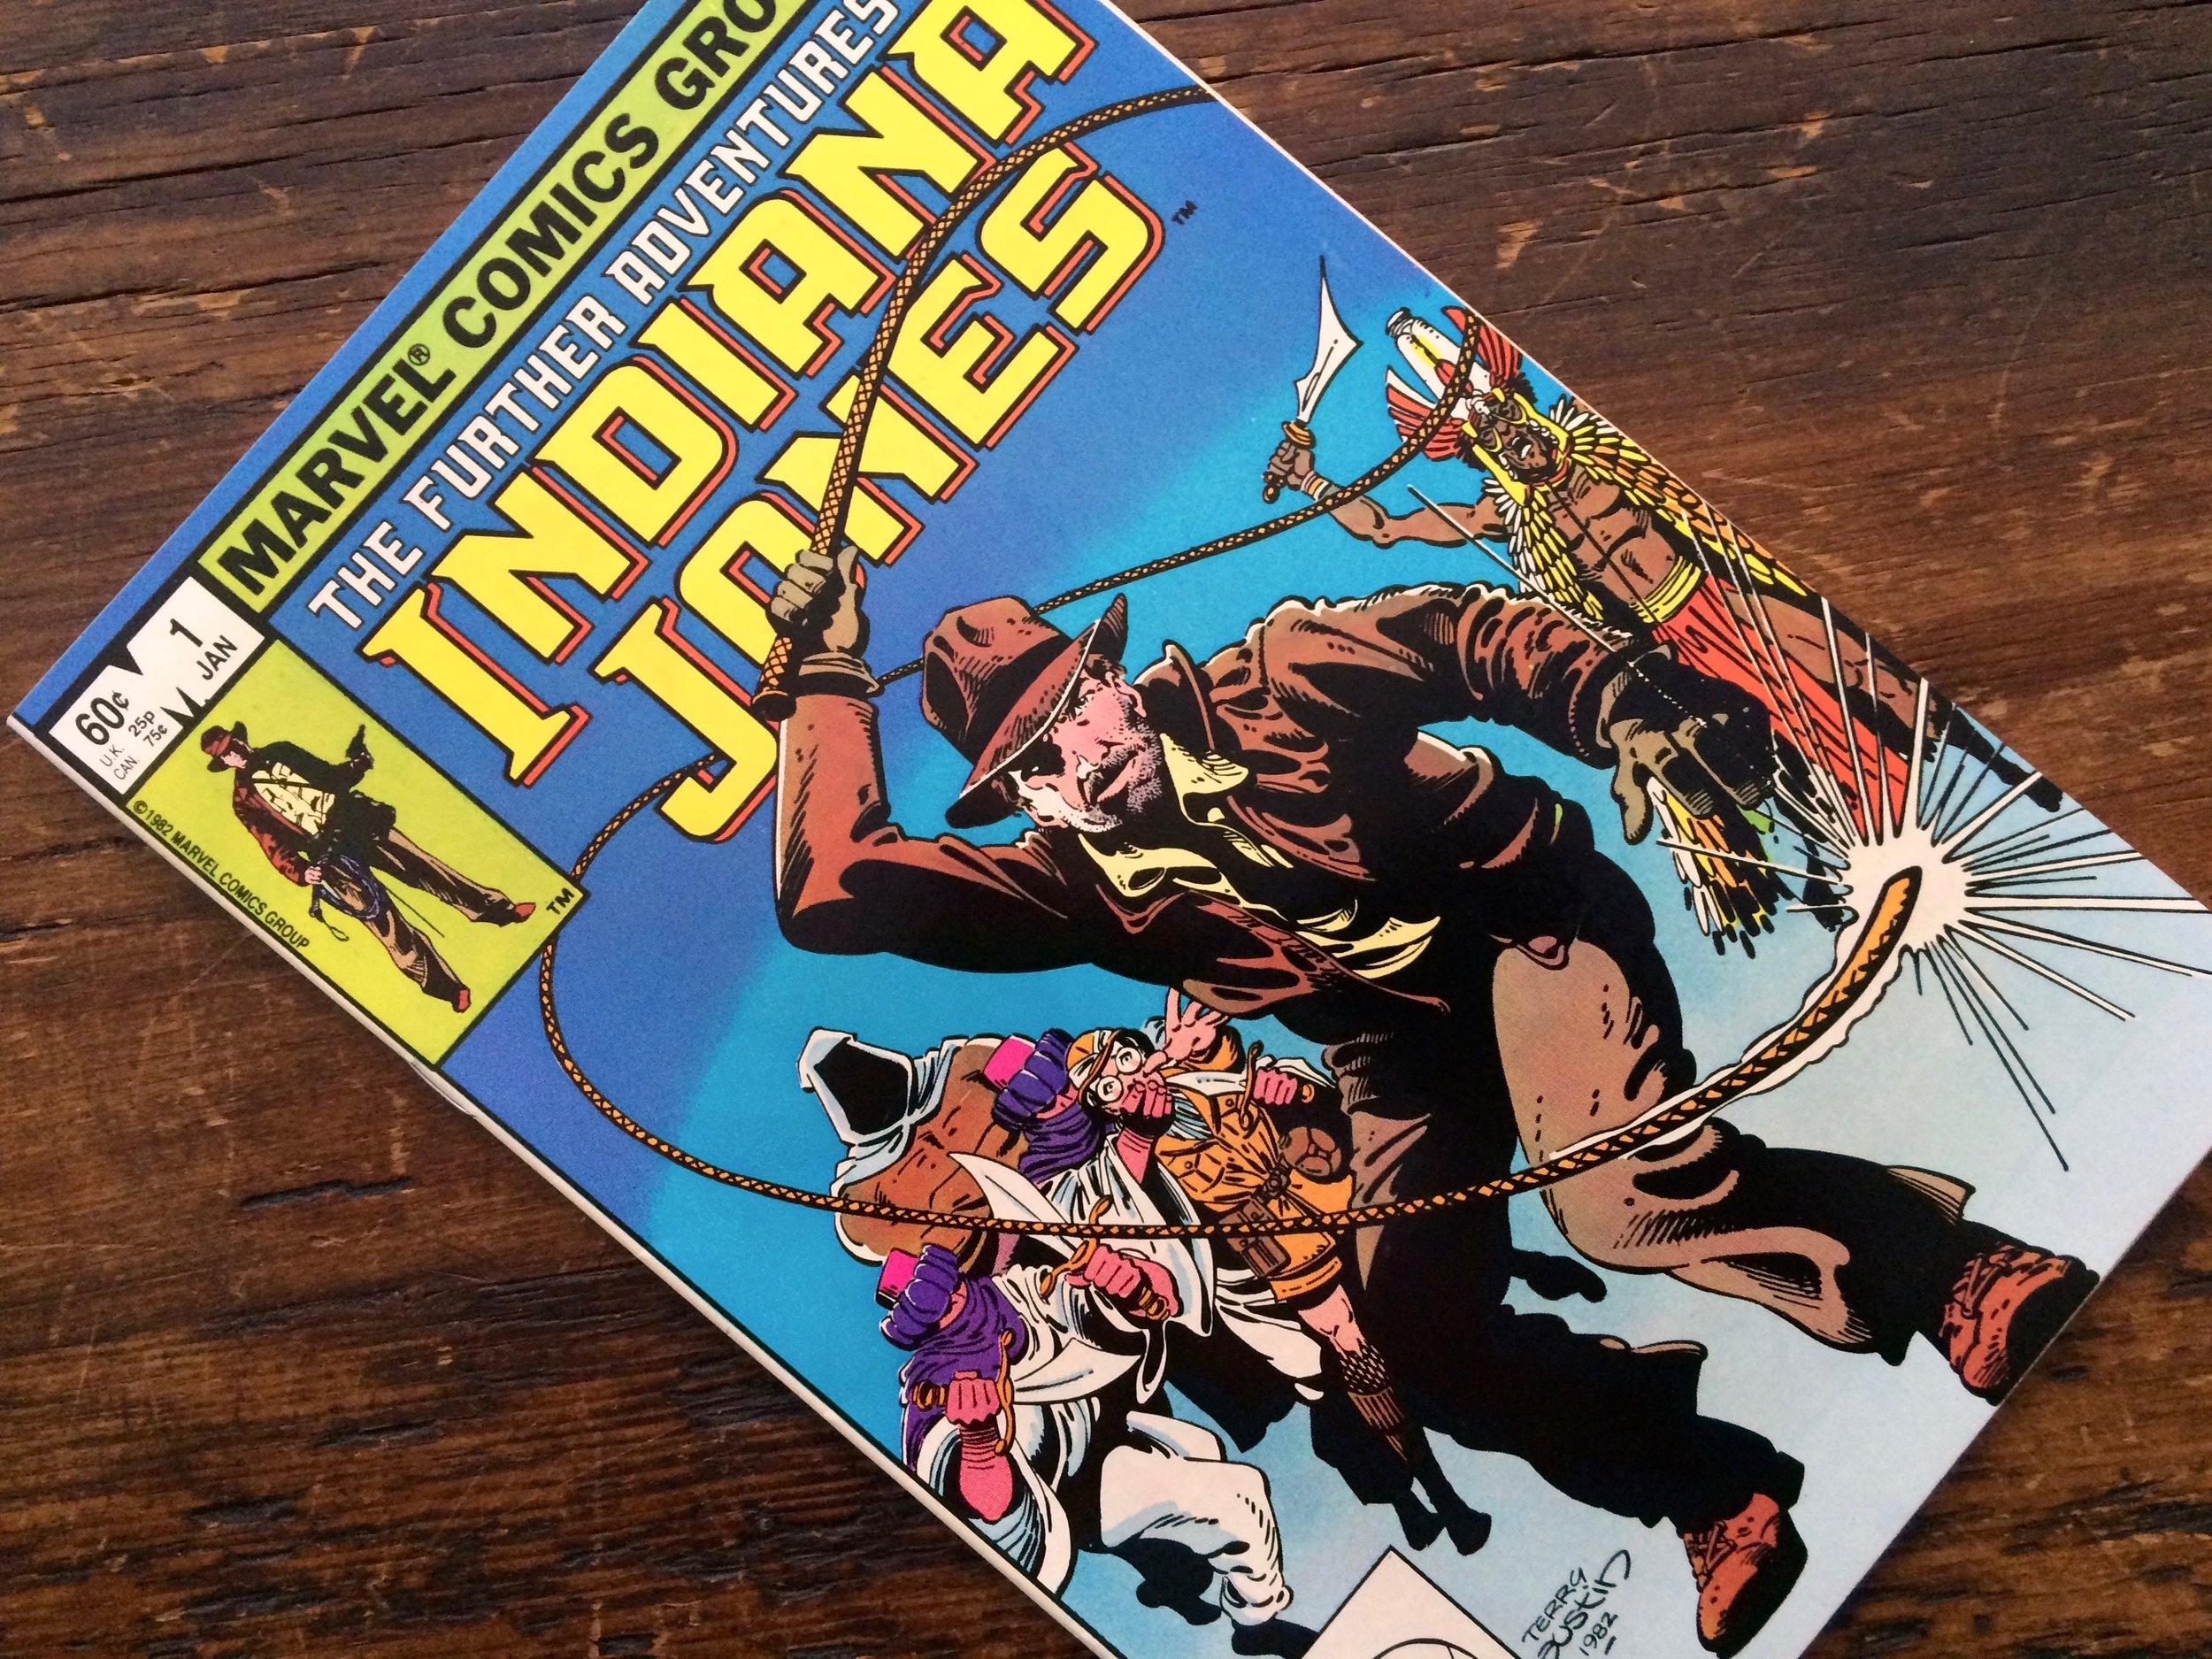 Indiana Jones #1 1983